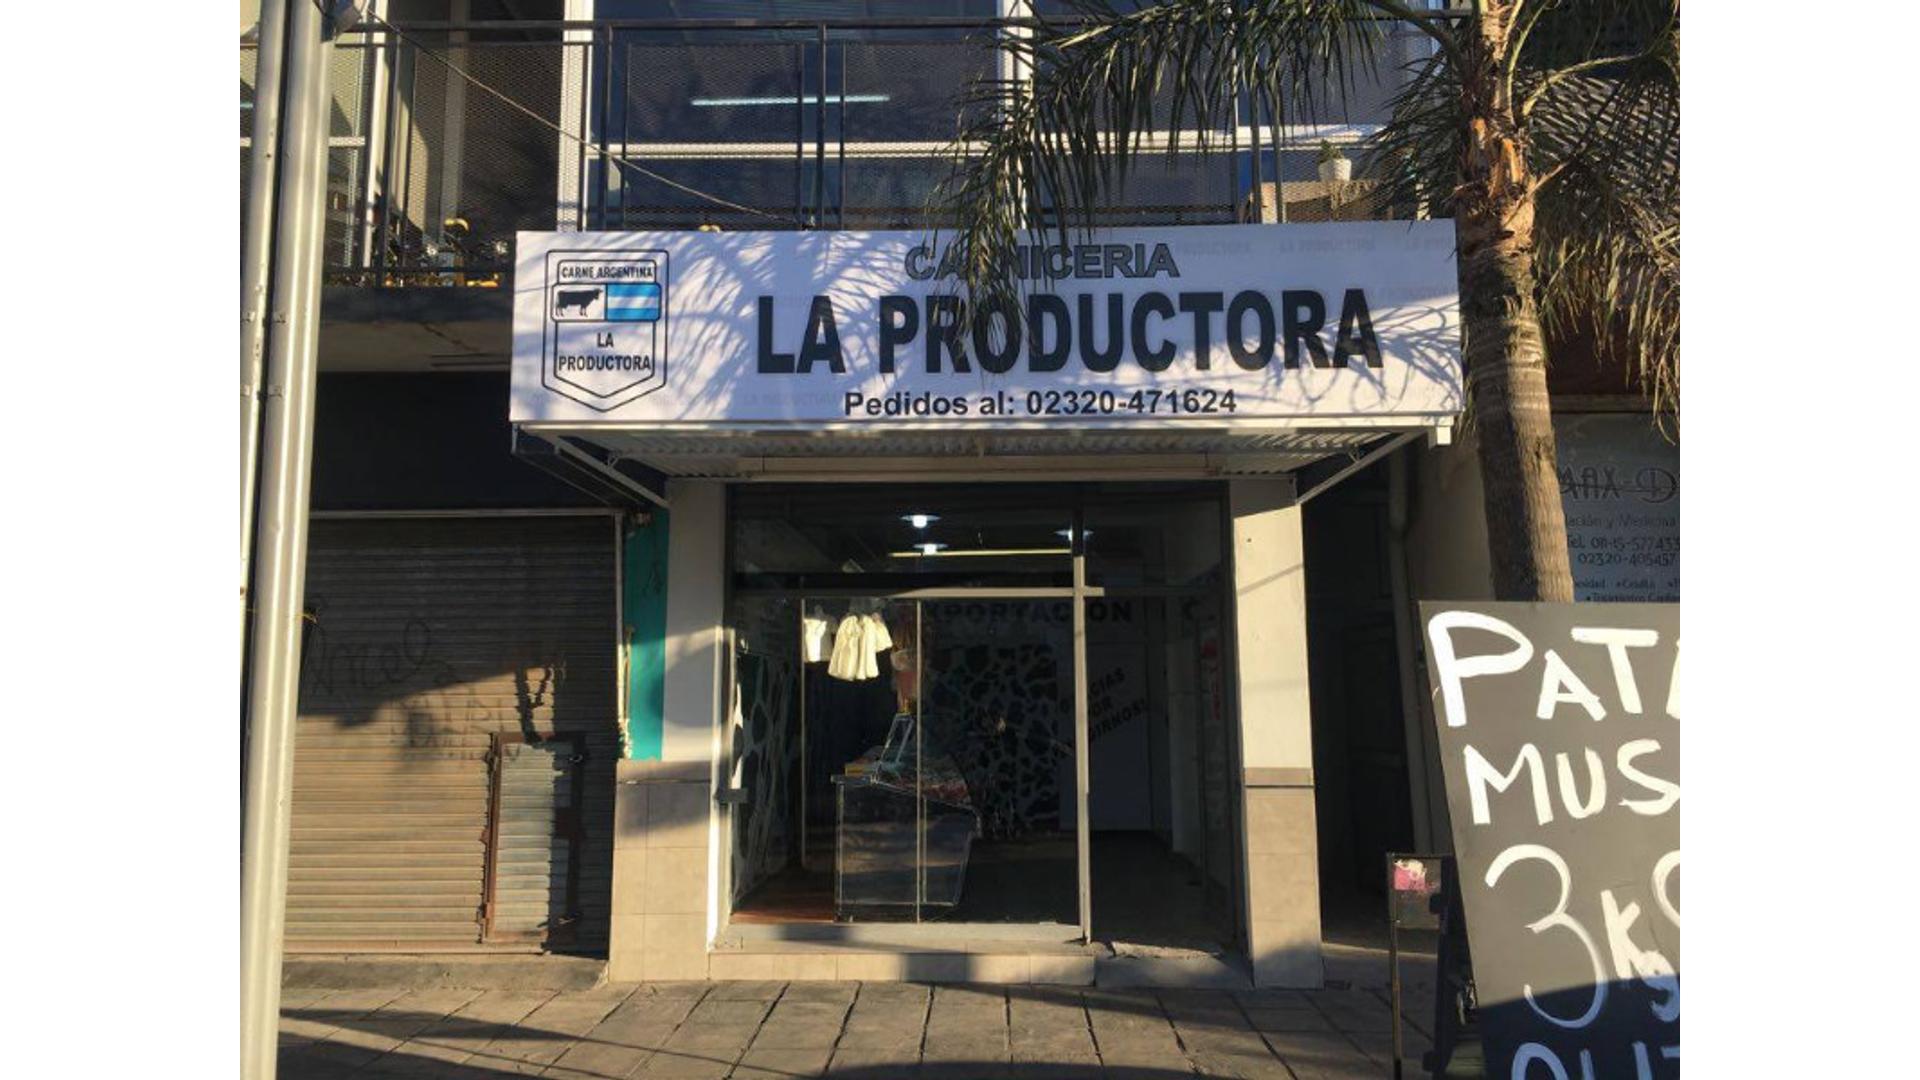 Av Madero 1200 - U$D 20.000 - Fondo de Comercio en Venta